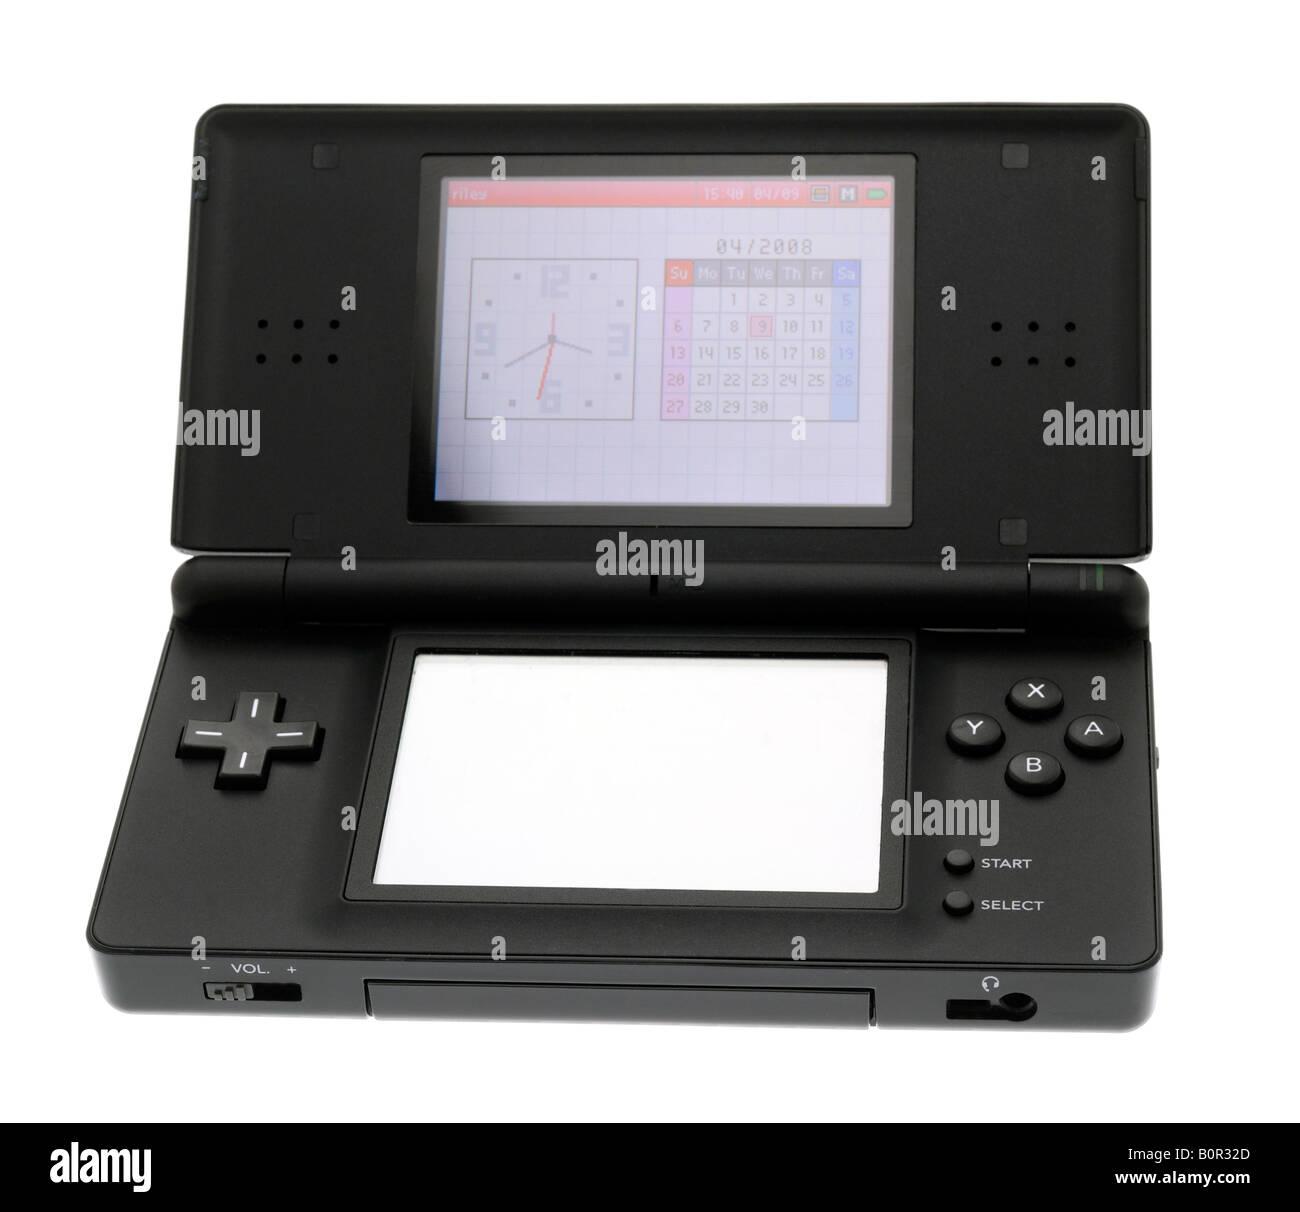 Nintendo Ds Lite Consola De Juegos Portatil Foto Imagen De Stock